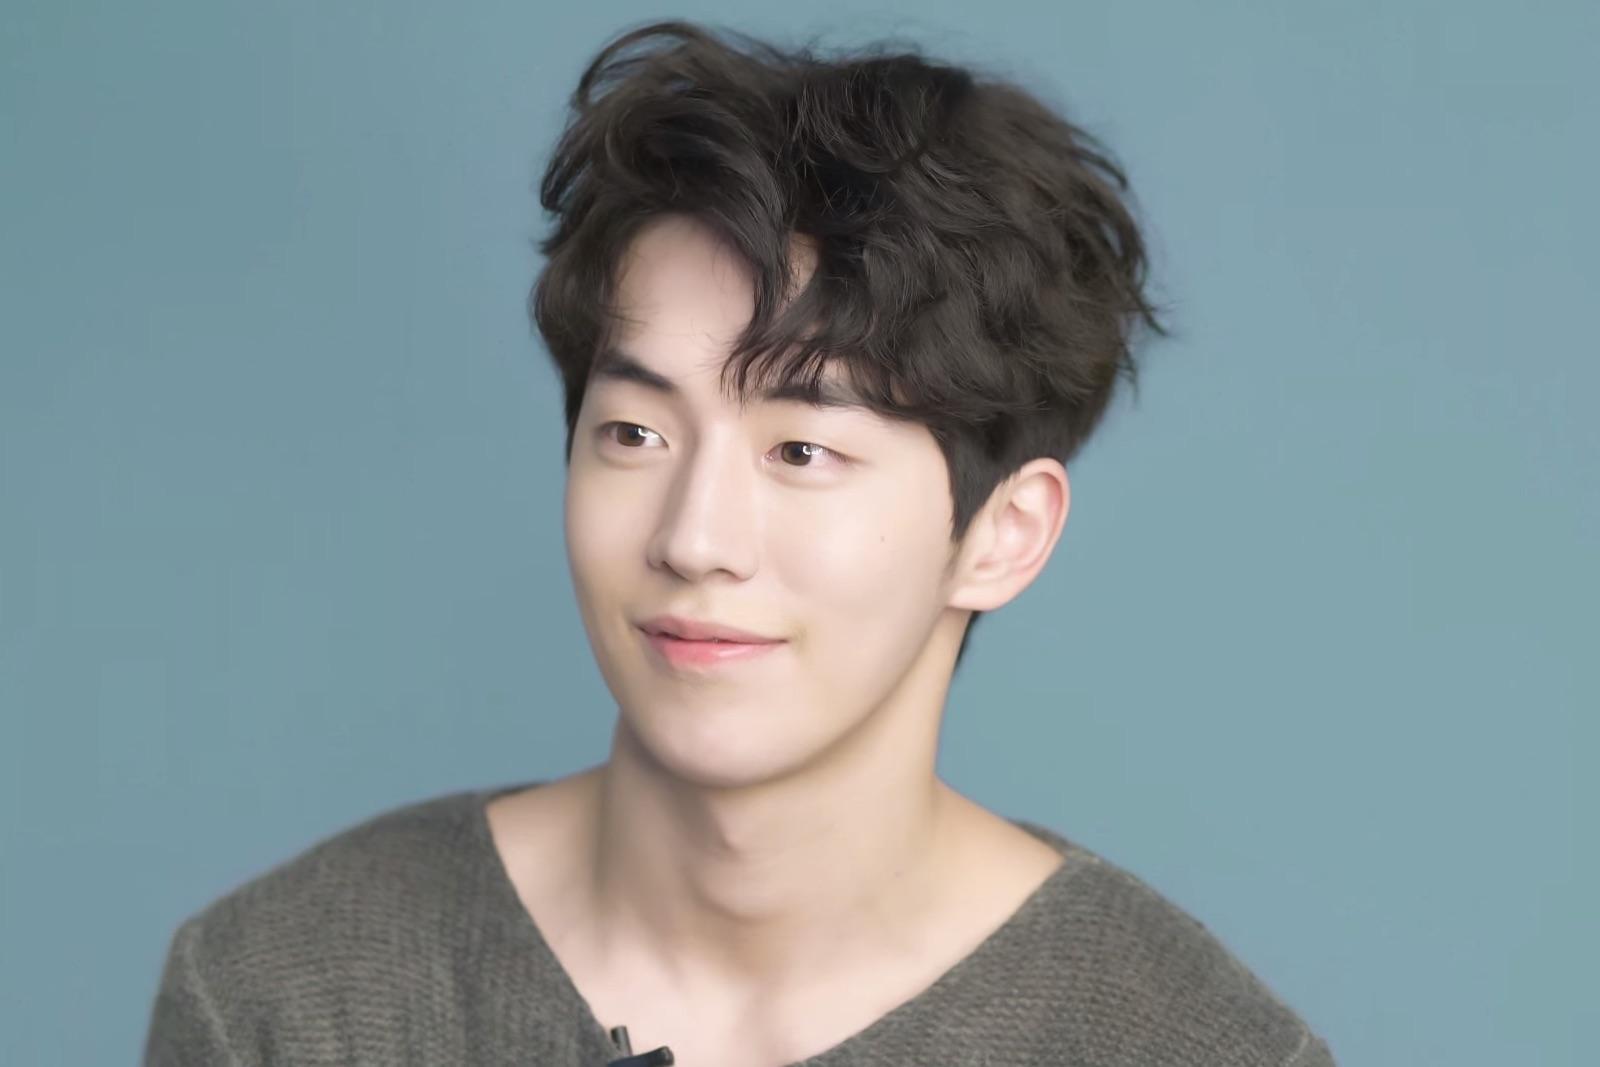 [Actor Spotlight] Nam Joo-hyuk